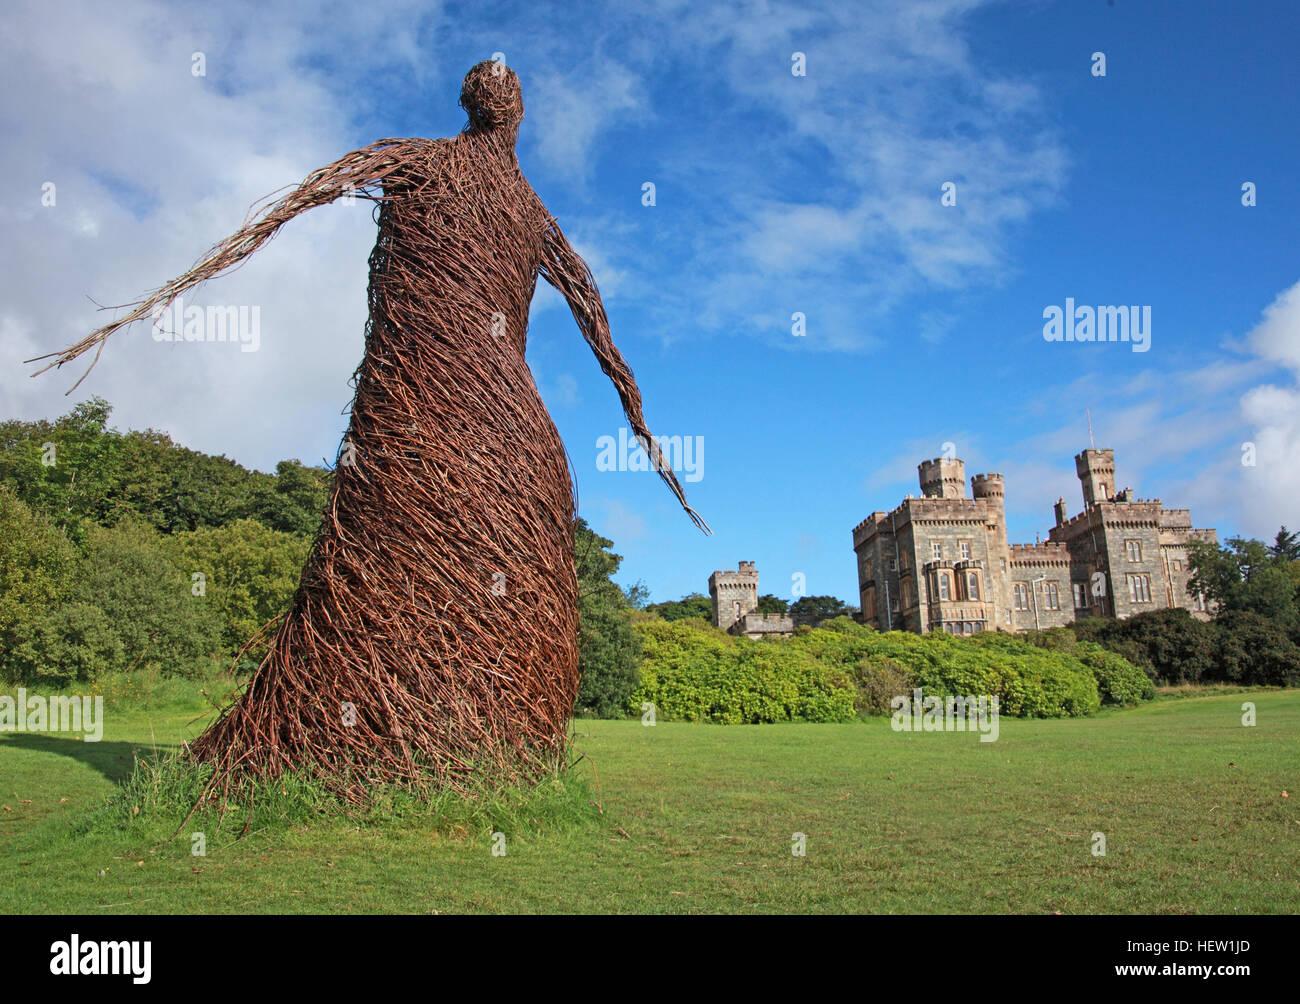 Stornoway Isle Of Lewis - Wicker Woman,Scotland,UK - Stock Image